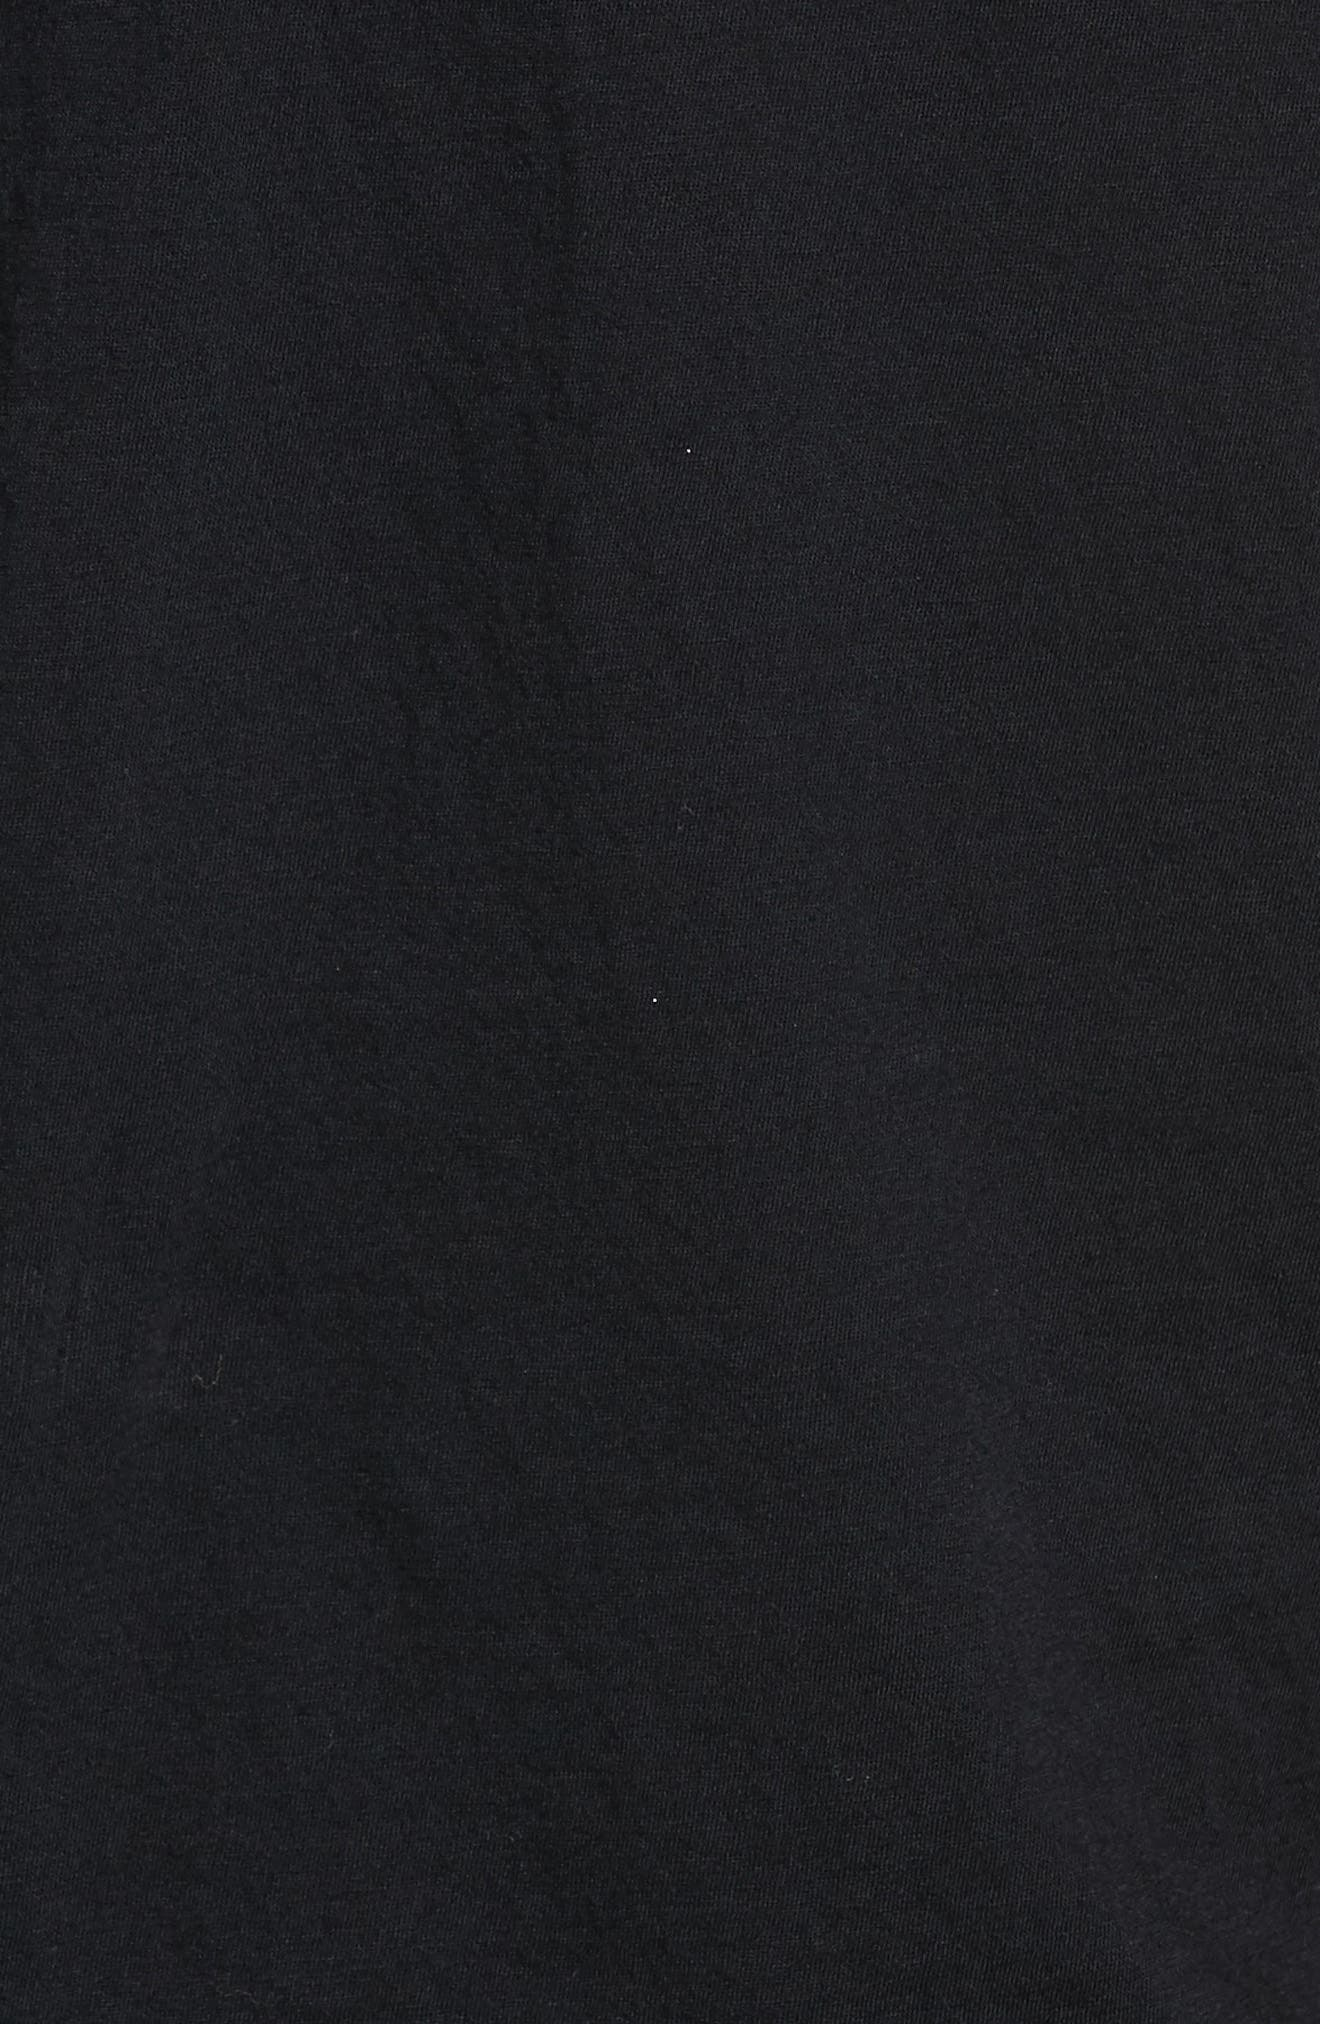 Fae Ruffle Tank,                             Alternate thumbnail 5, color,                             True Black